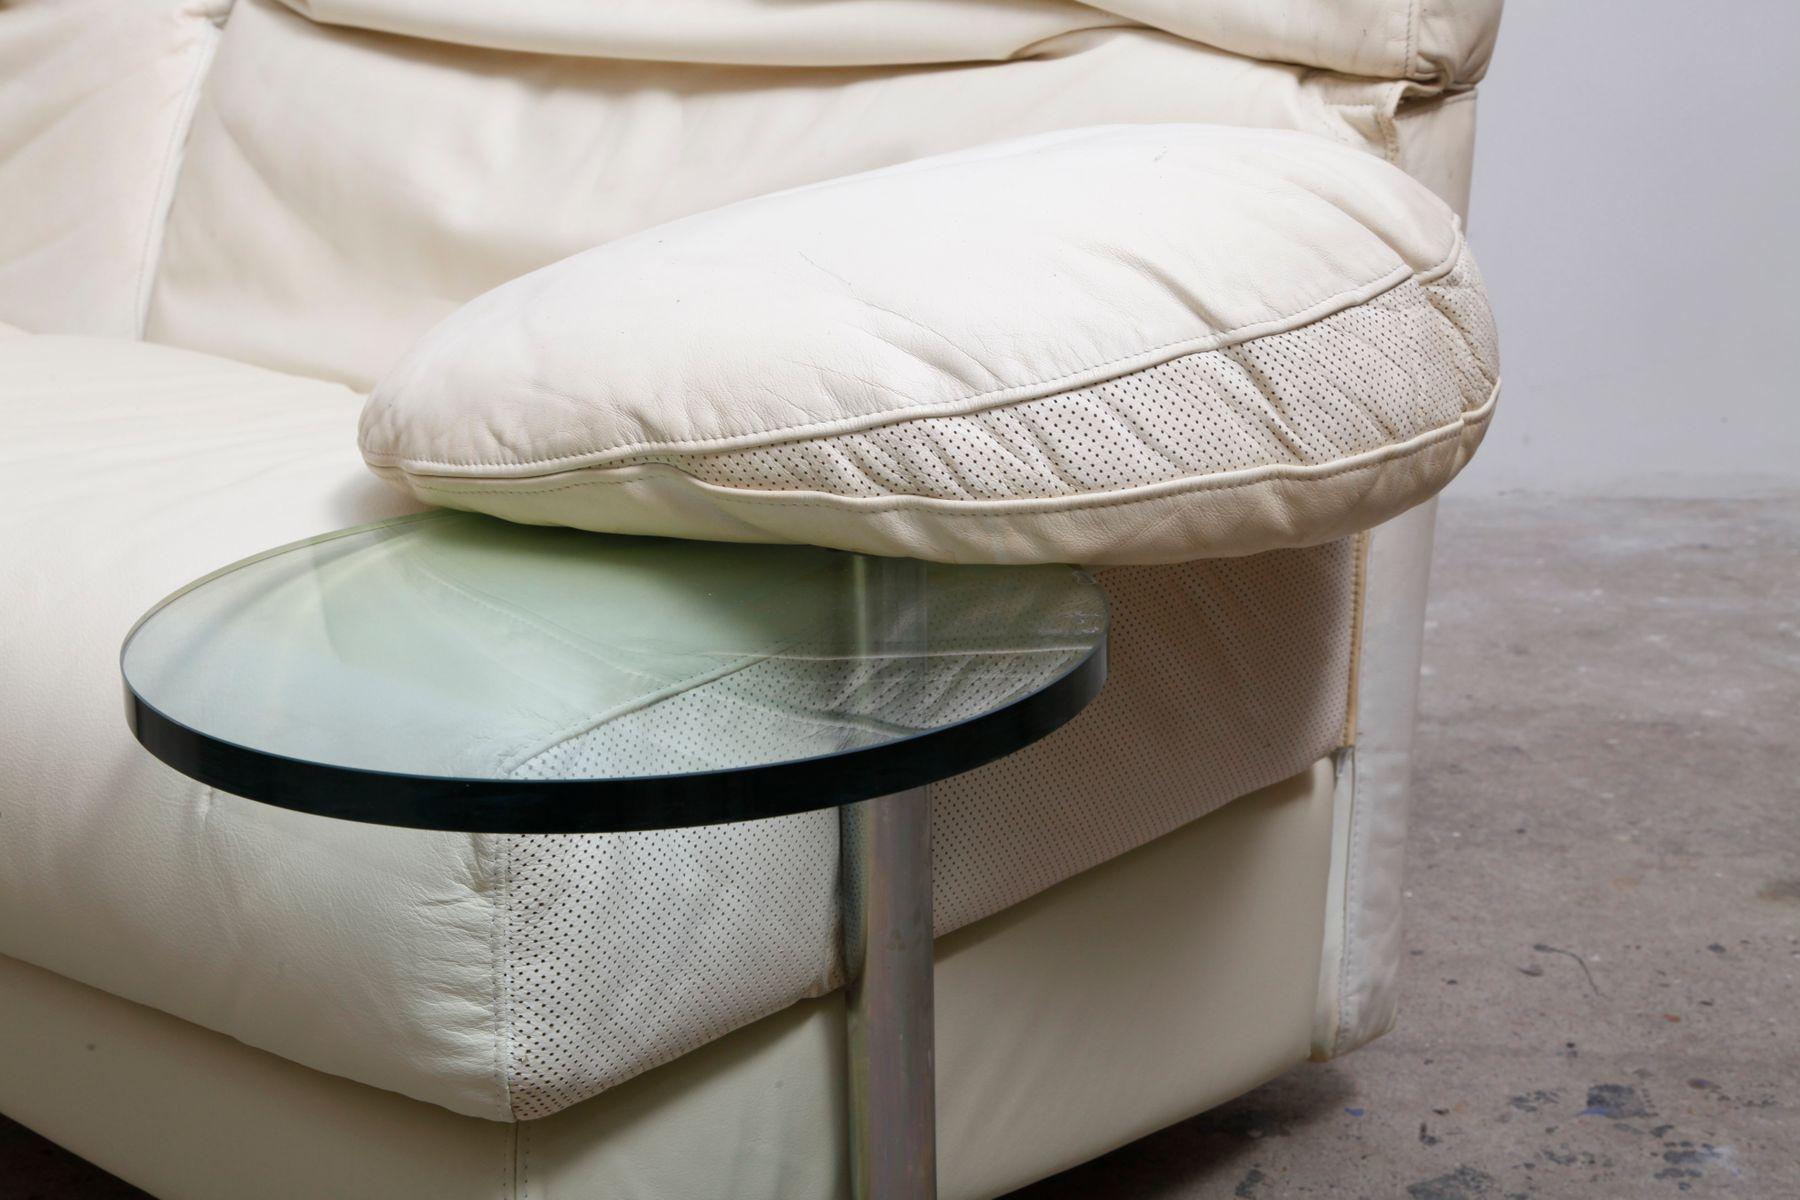 wei es arca ledersofa von paolo piva f r b b italia 1984. Black Bedroom Furniture Sets. Home Design Ideas